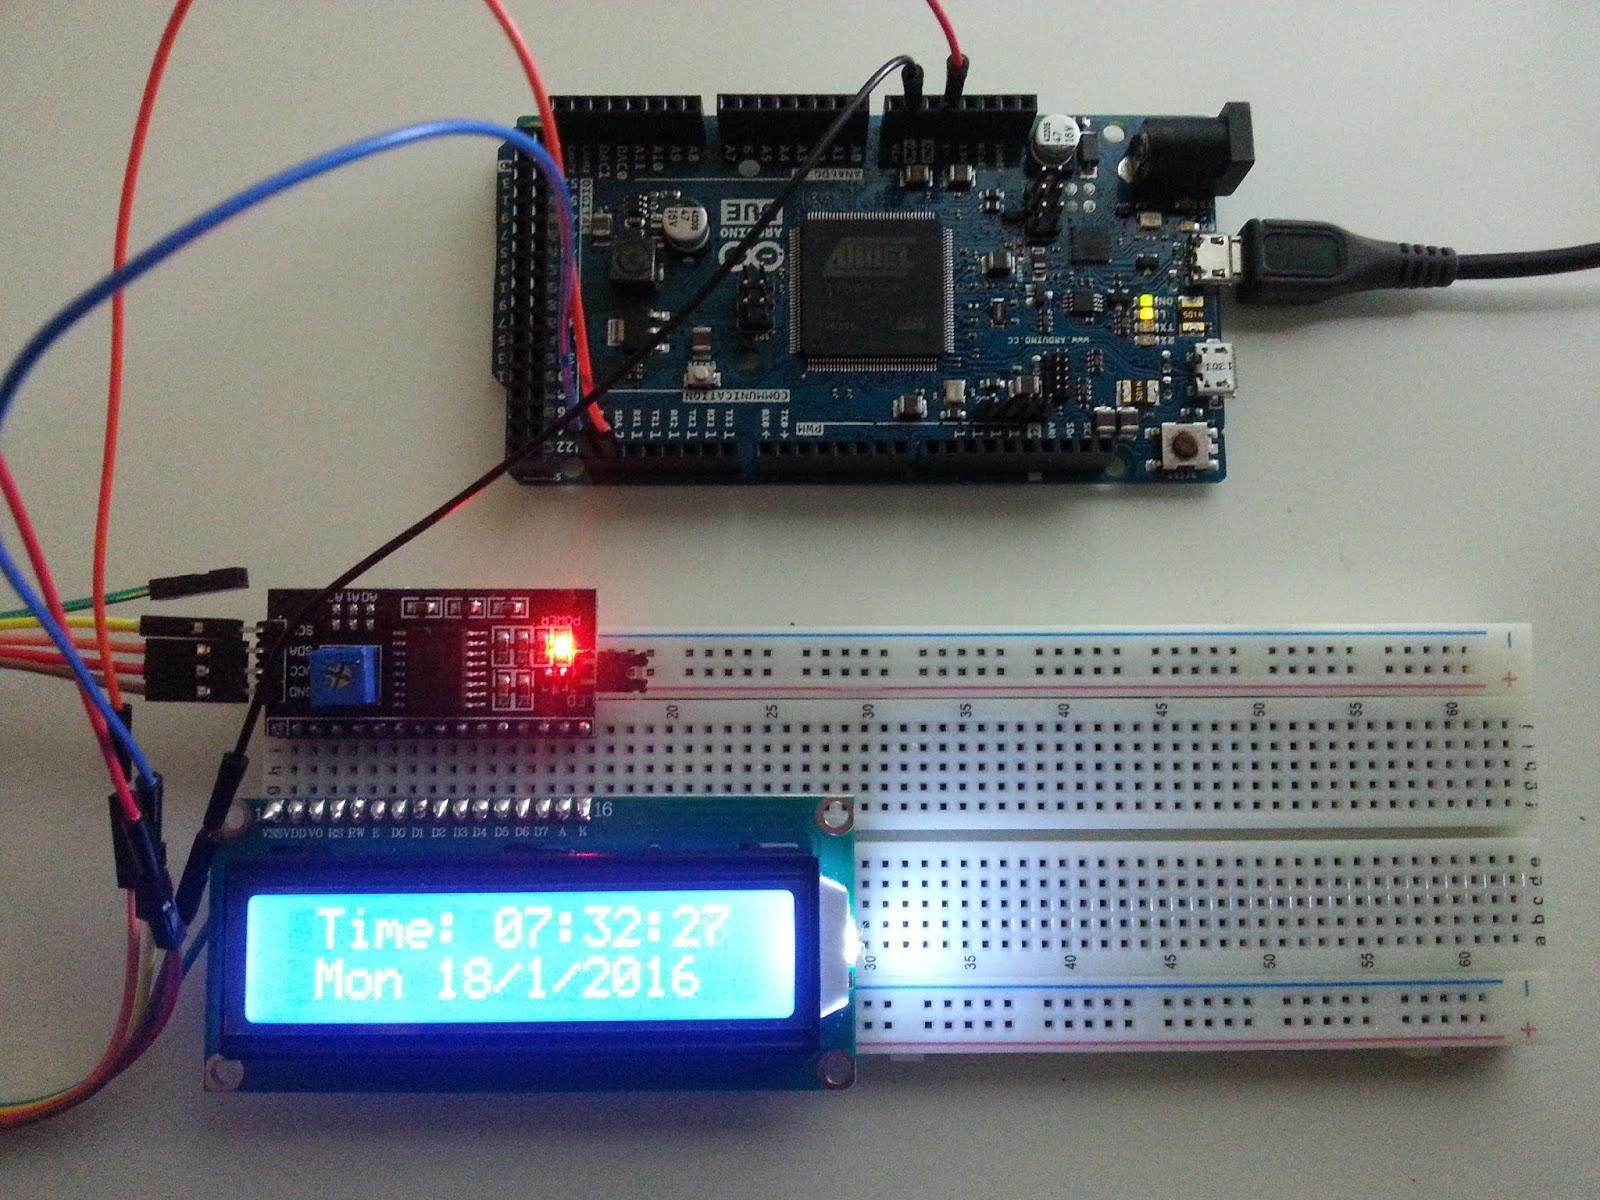 Electromania: Clock and calendar using Arduino due internal